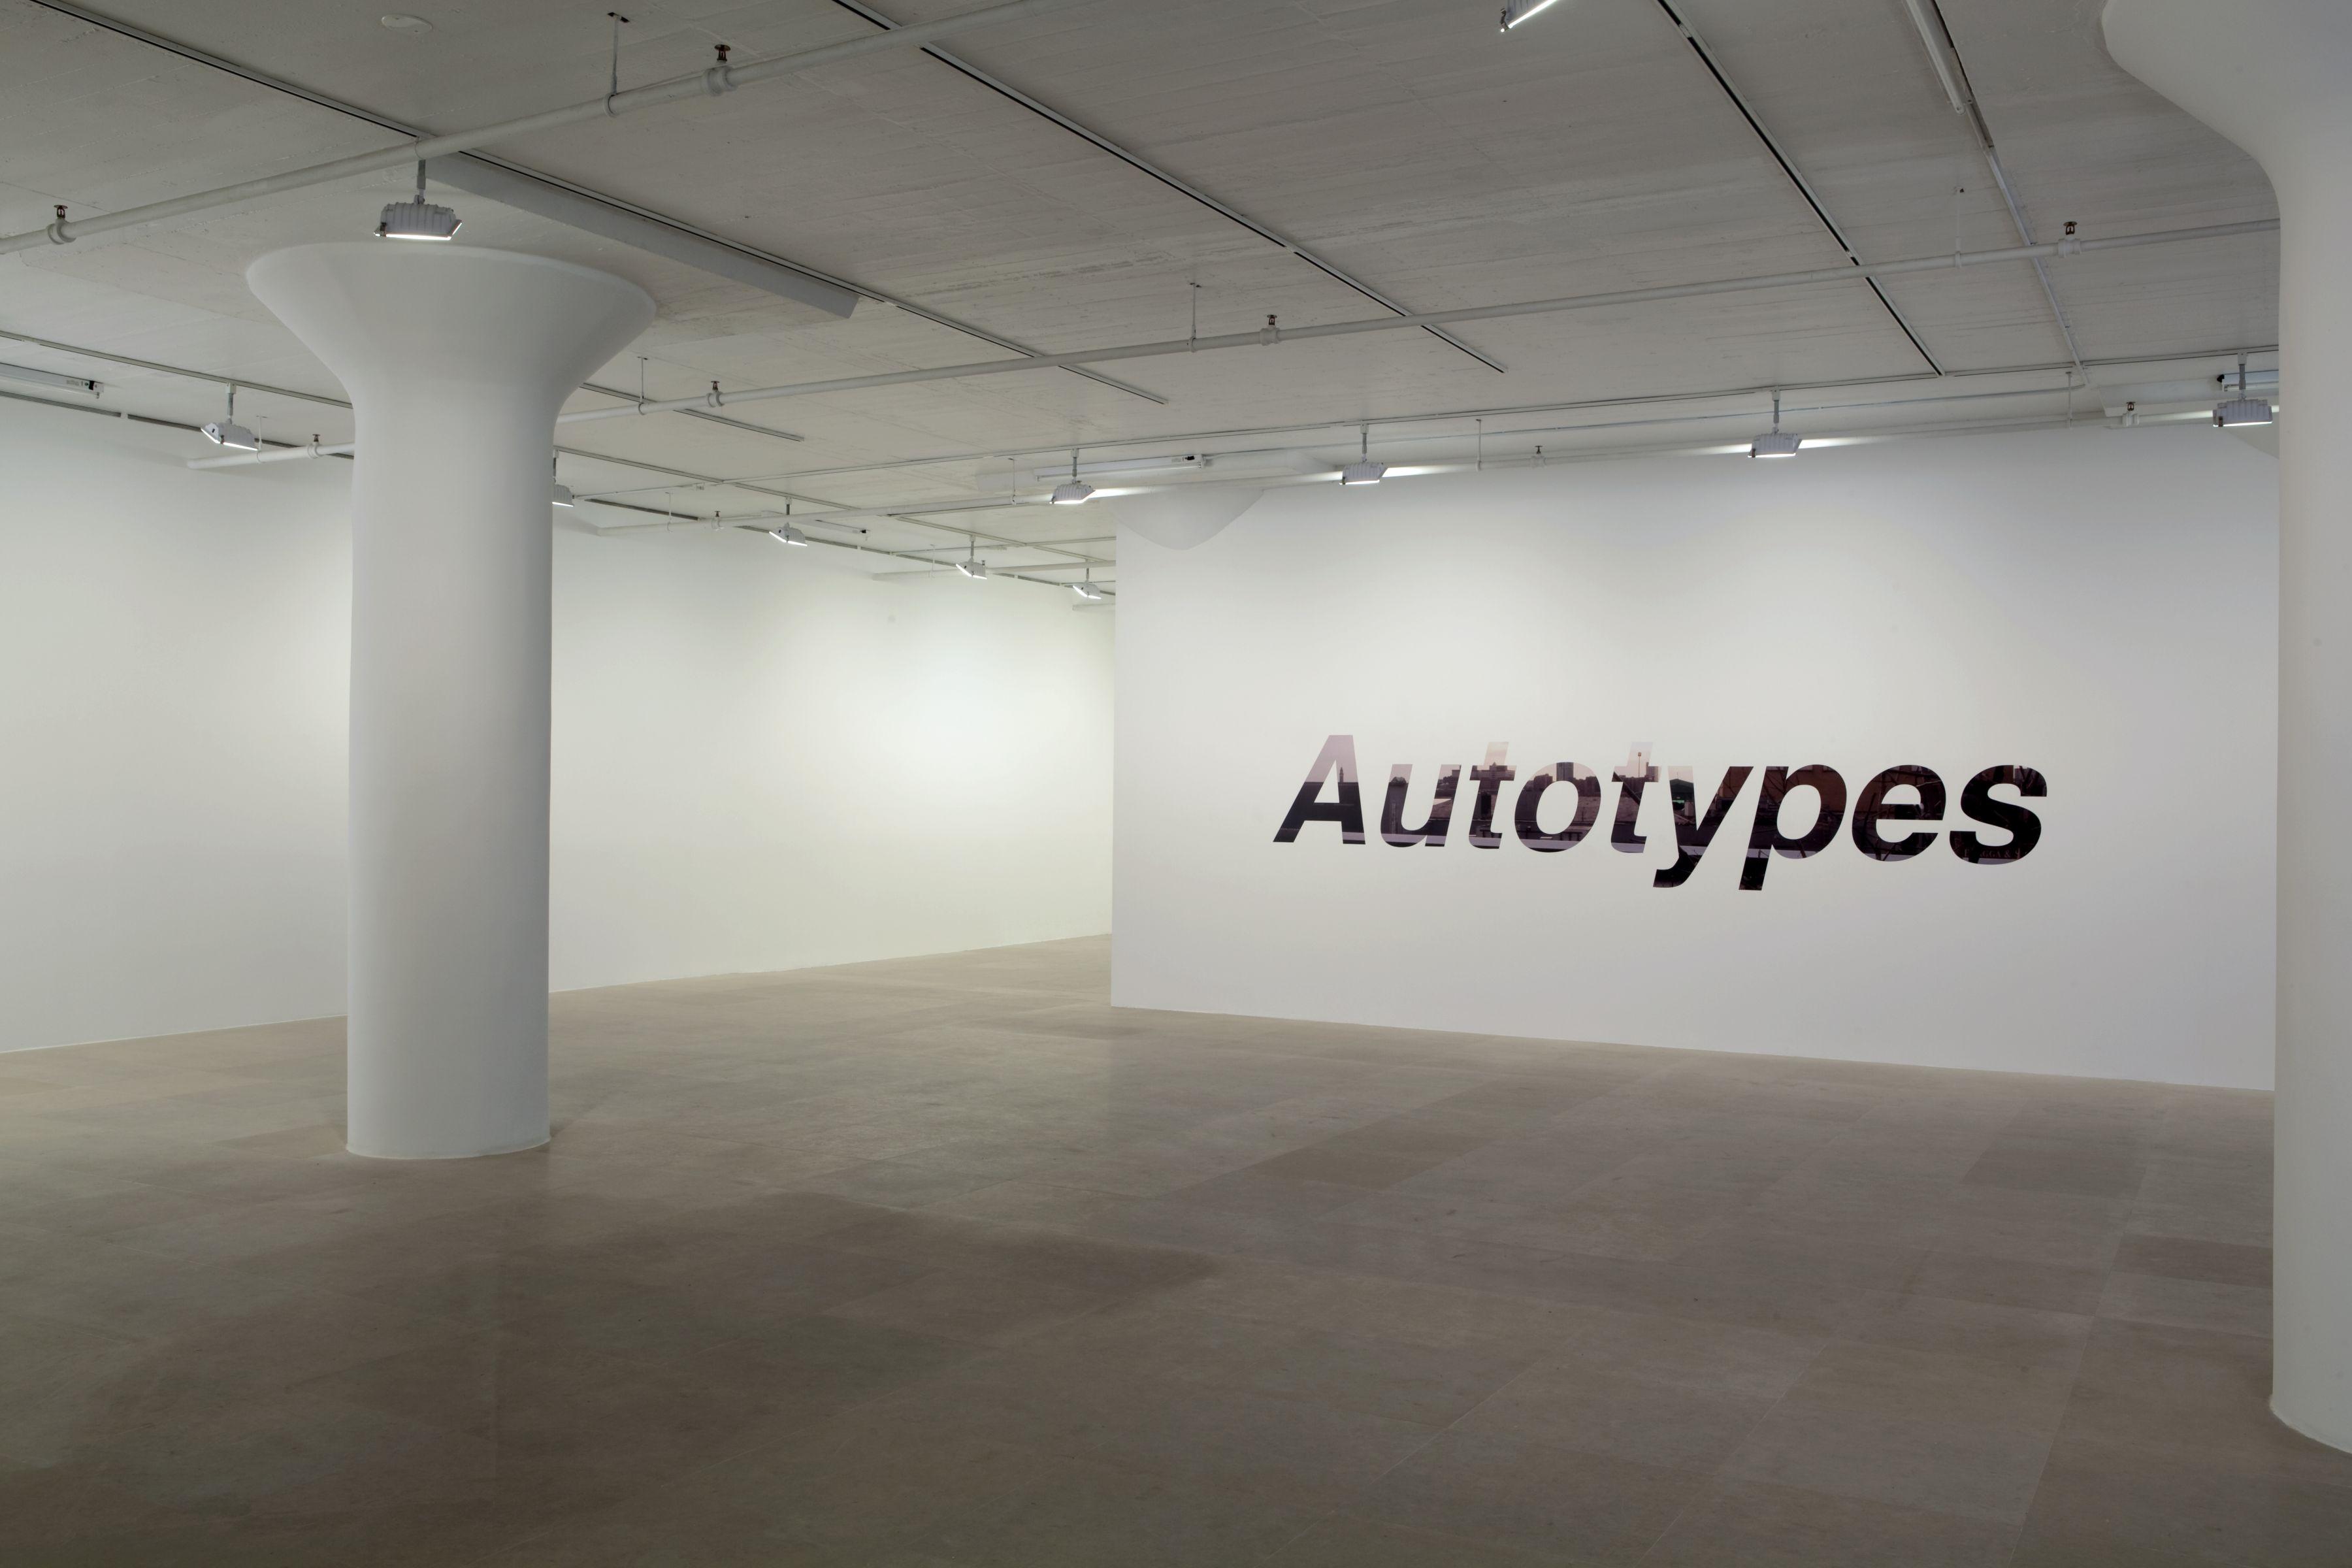 John Knight, Installation view, Autotypes, a work in situ, Greene Naftali, New York, 2011